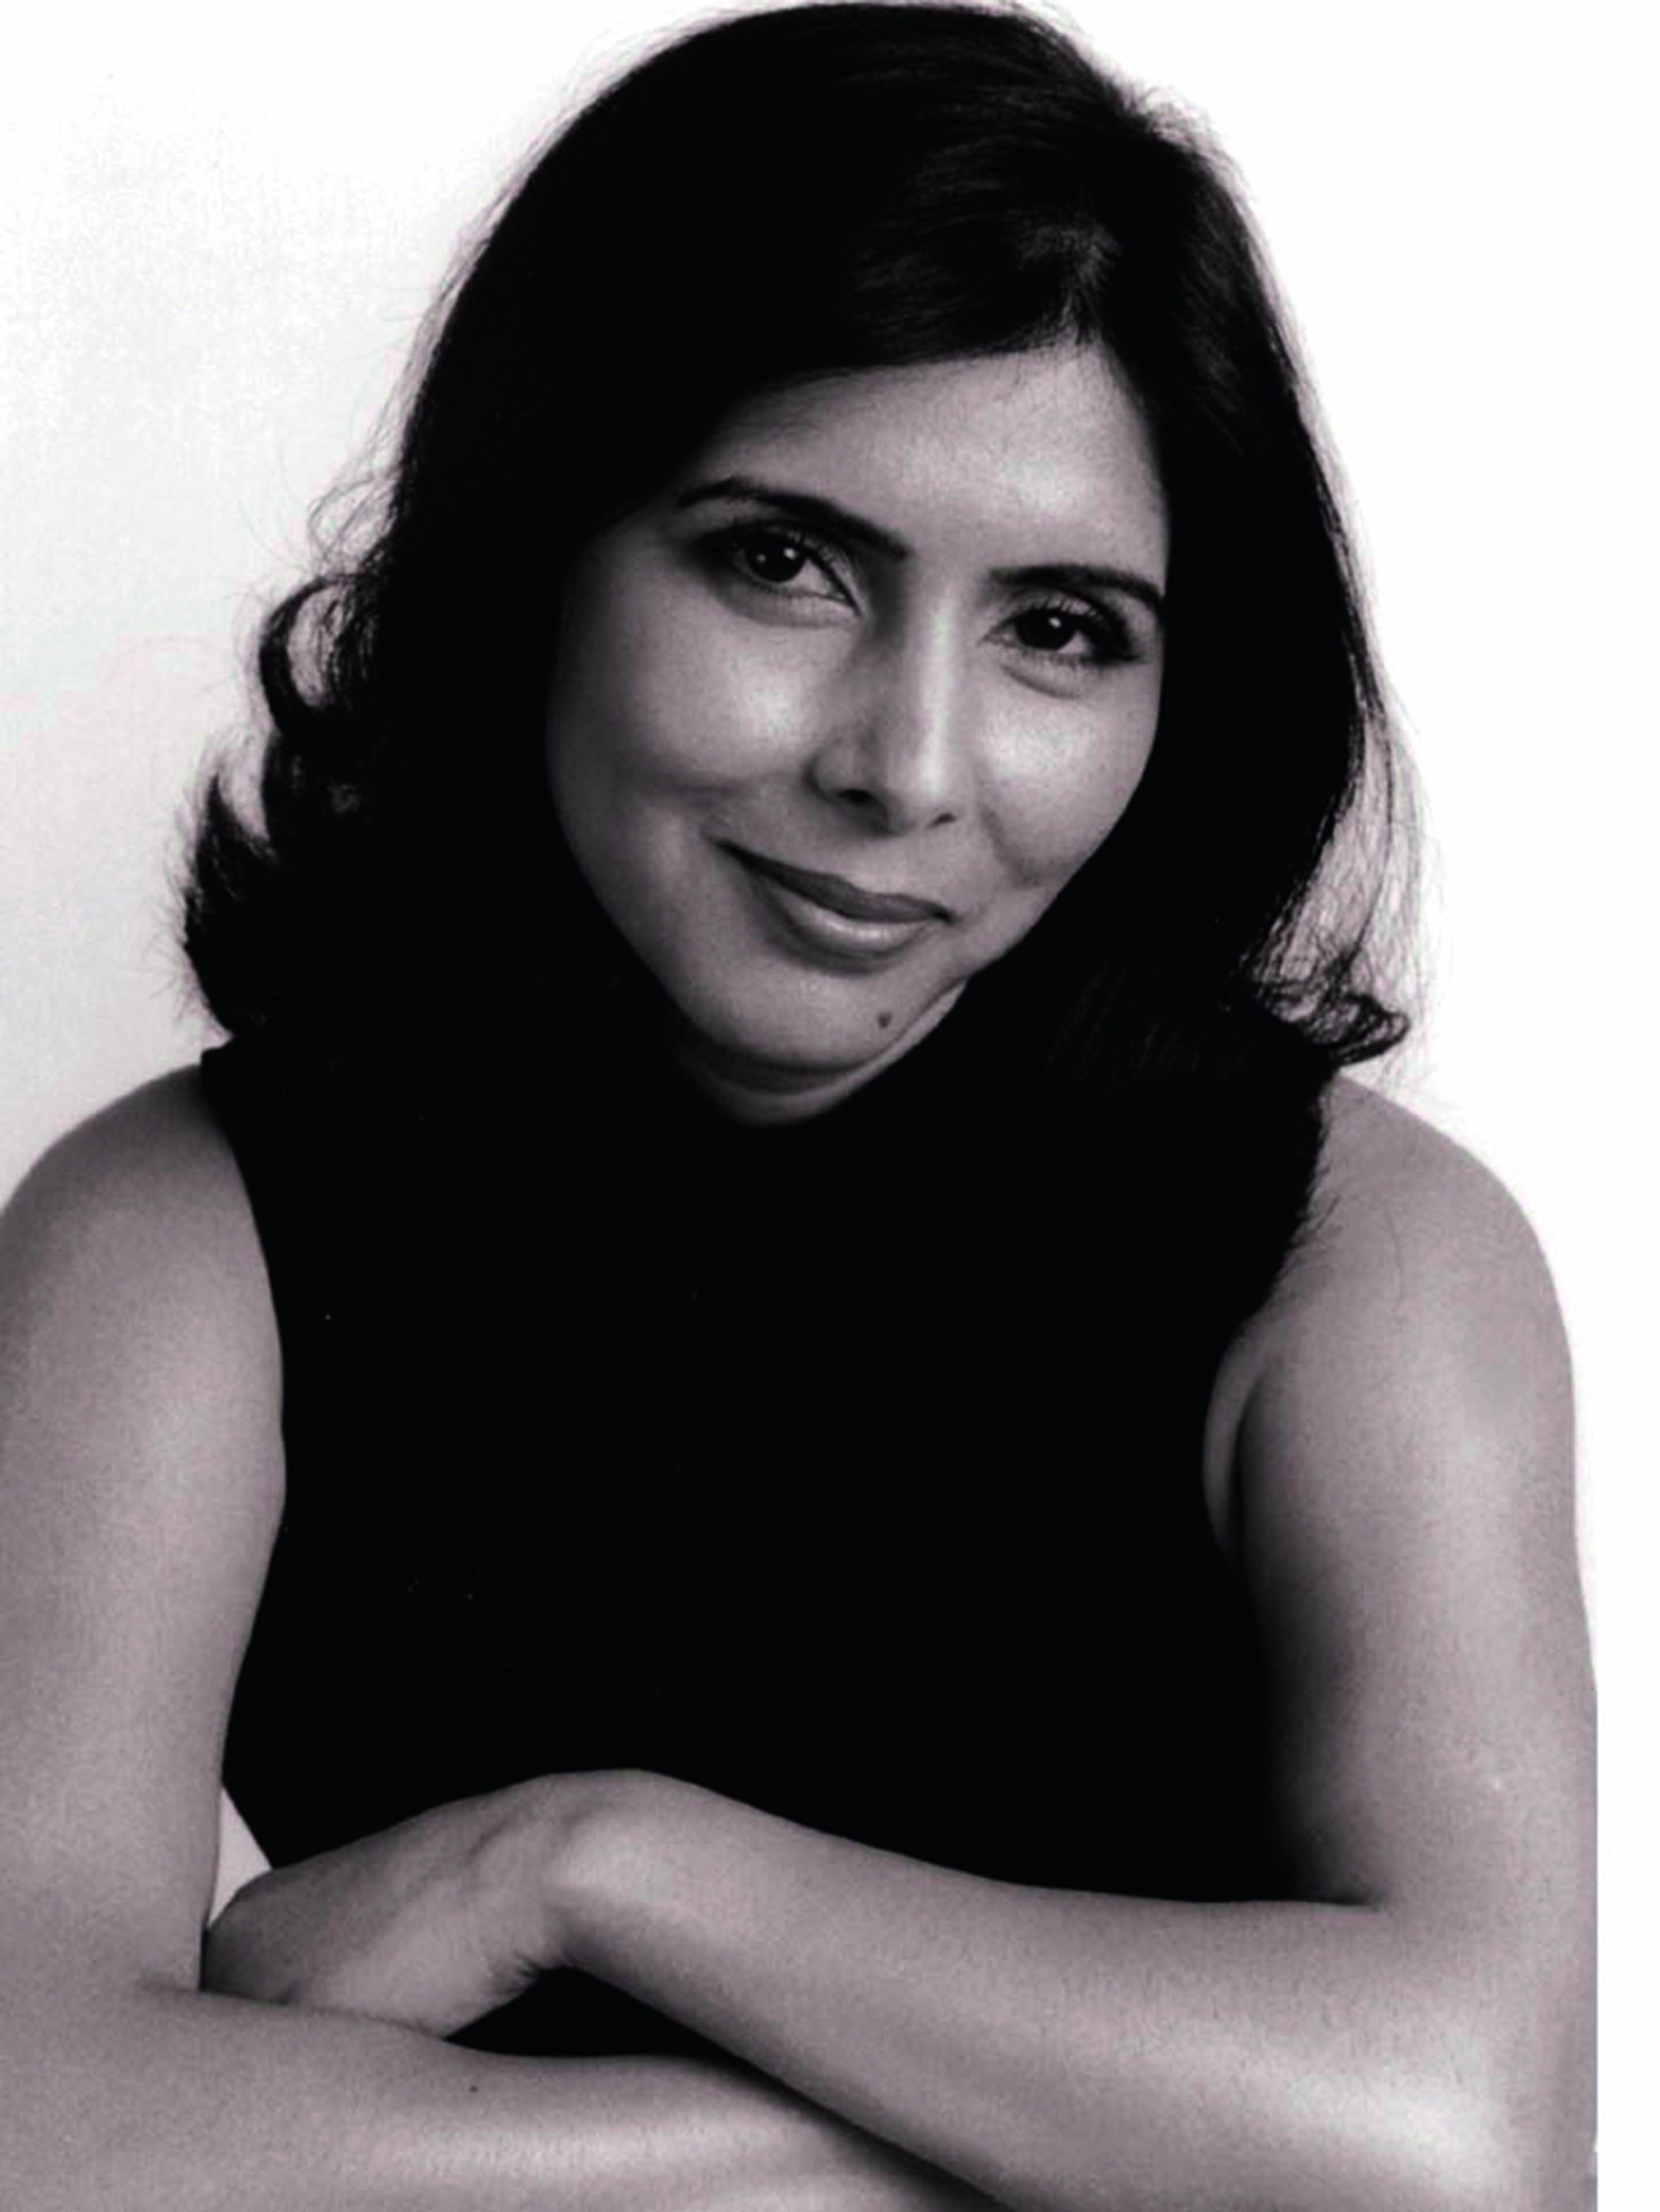 Rehna Azim